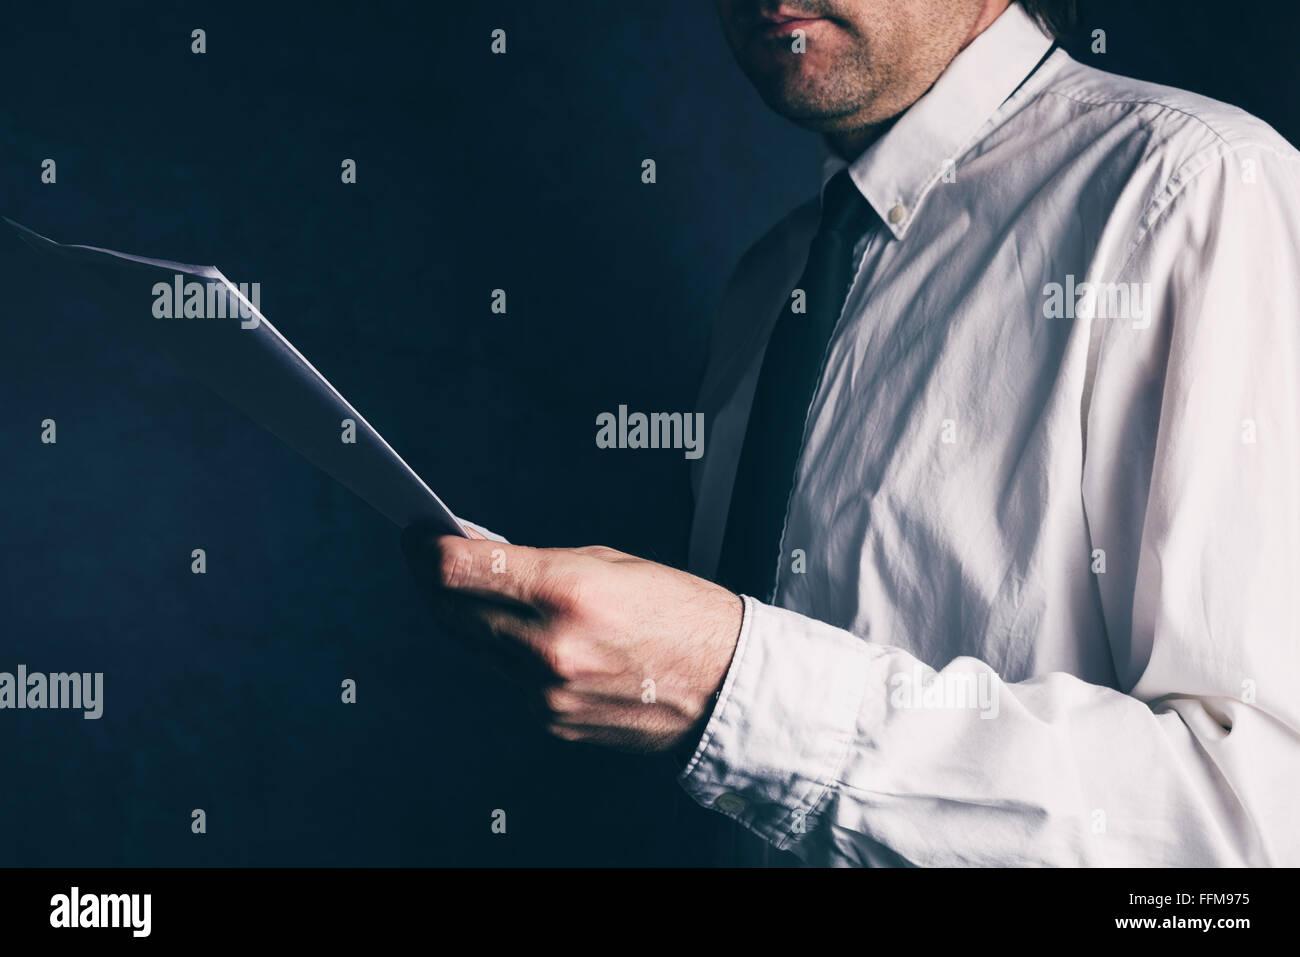 Inspektor tun, Rechnungsprüfung, Geschäftsmann, Geschäftsbericht, Retro-getönten lesen, selektiven Fokus zu besteuern Stockfoto